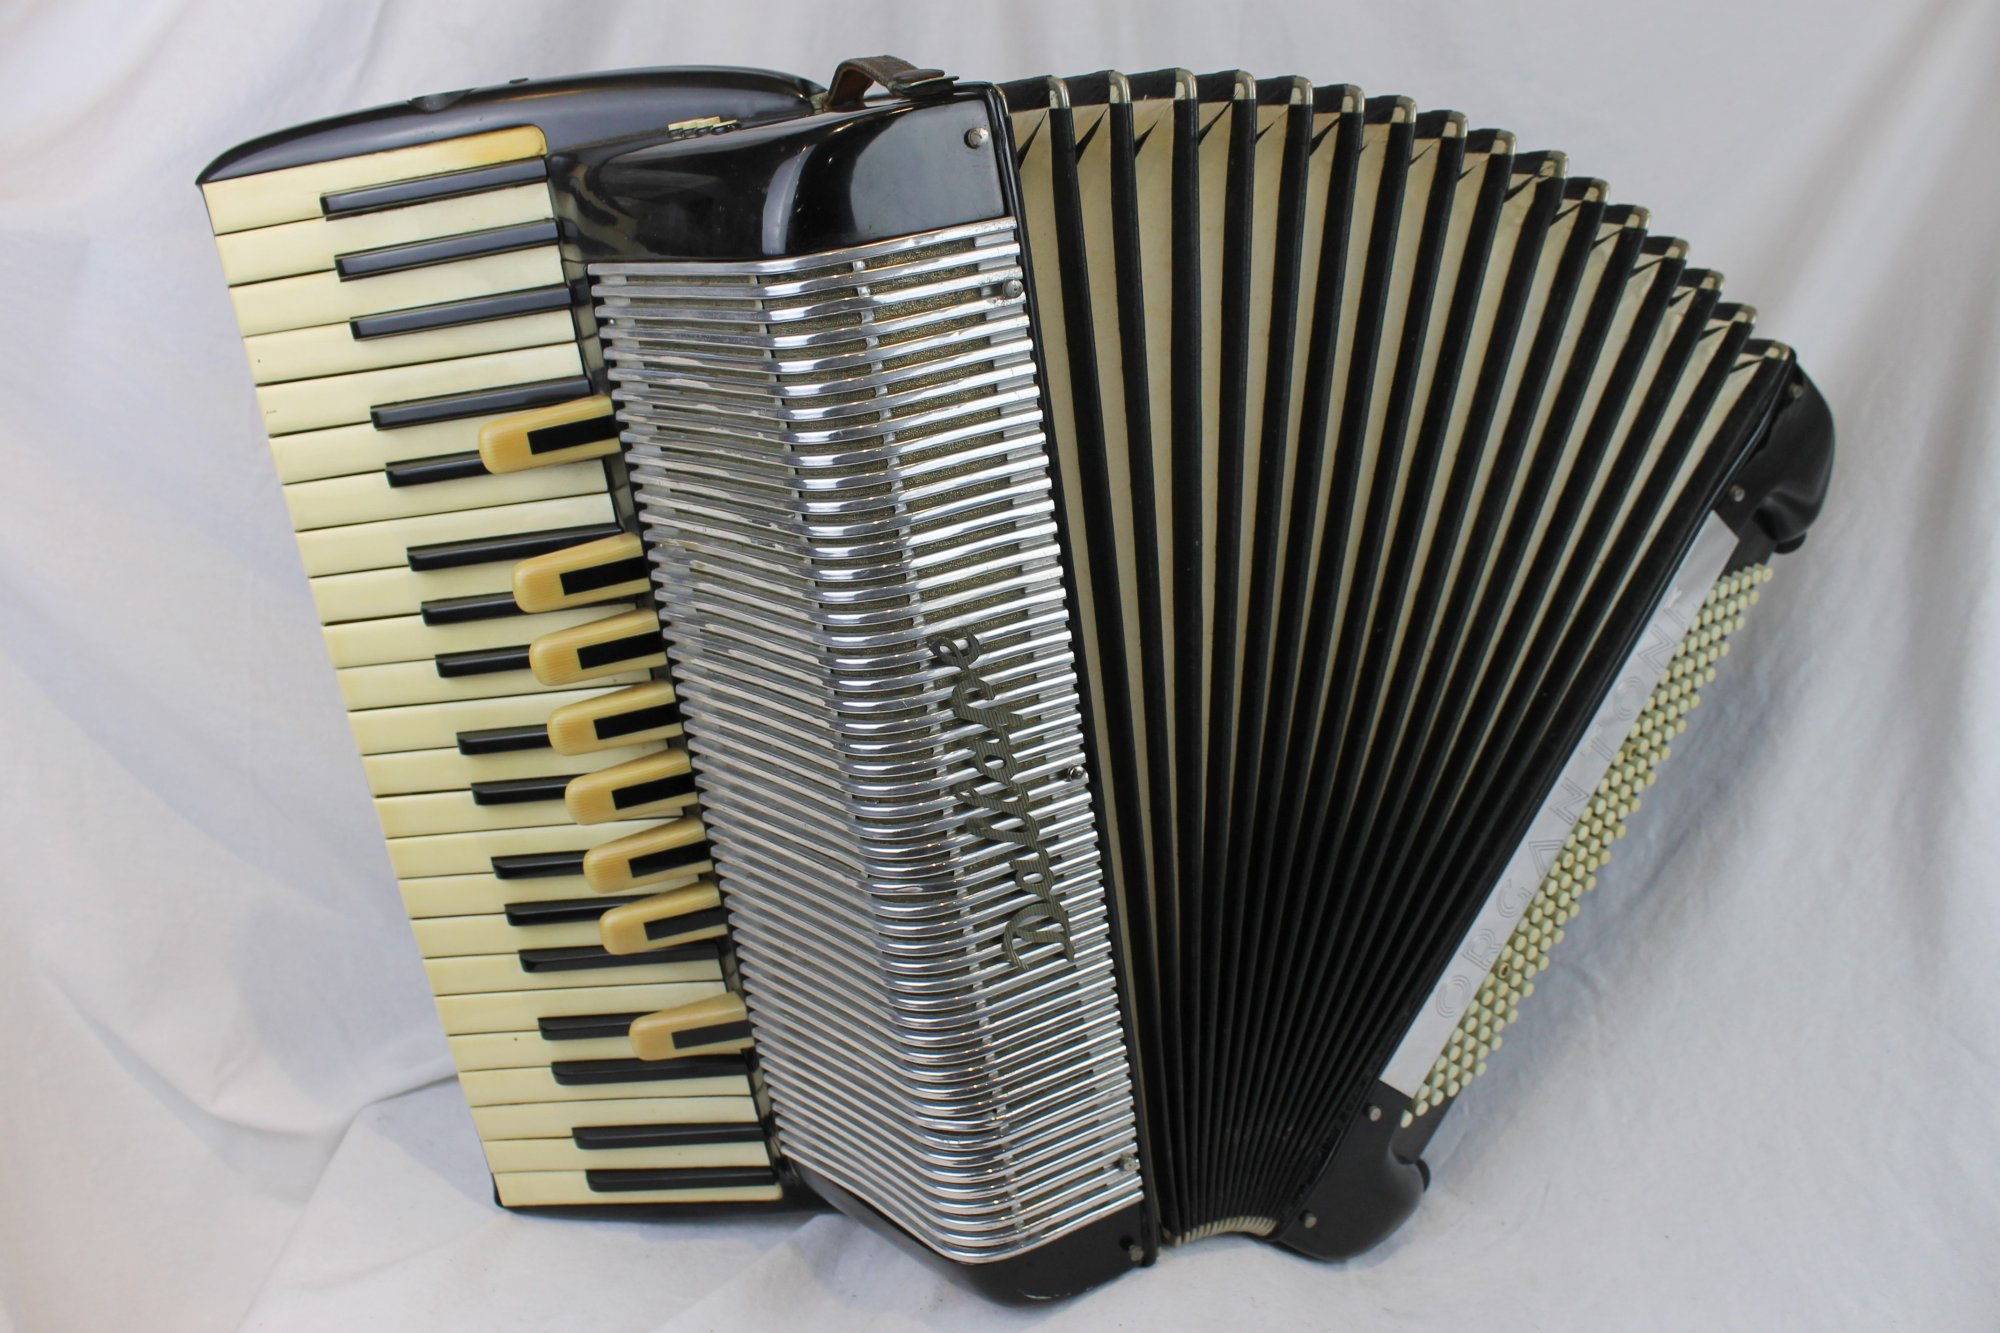 4219 - Fixer Upper Black Dallape Organtone Tone Chamber Piano Accordion LMMH 41 120 FOR PARTS OR REPAIR